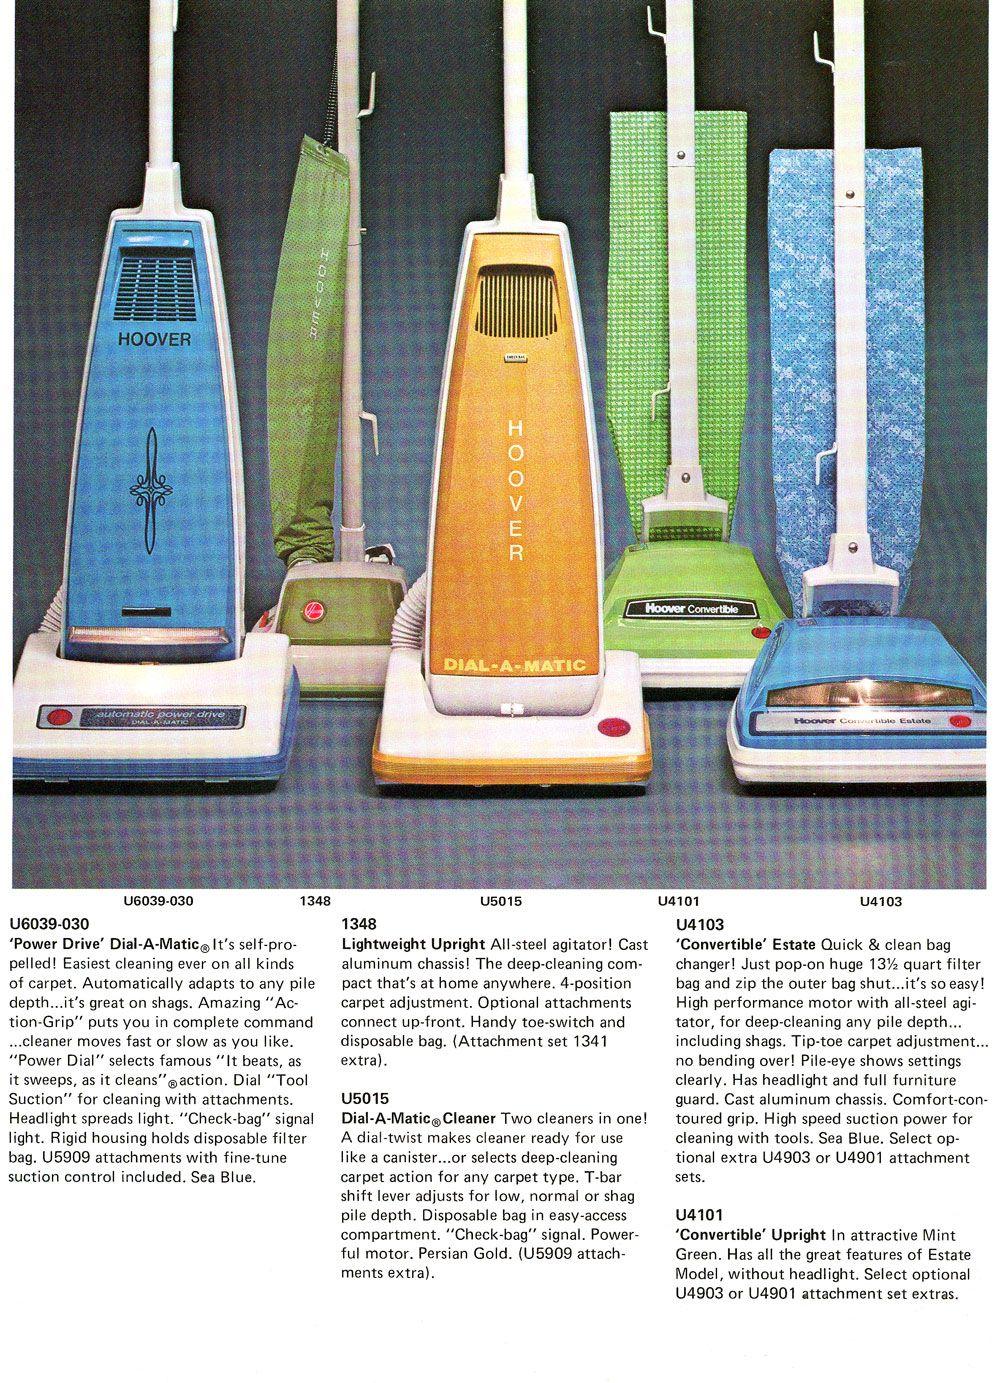 Hoover Us Full Line Catalog Late 70s Vintage Vacuum Cleaner Vintage Appliances Hoover